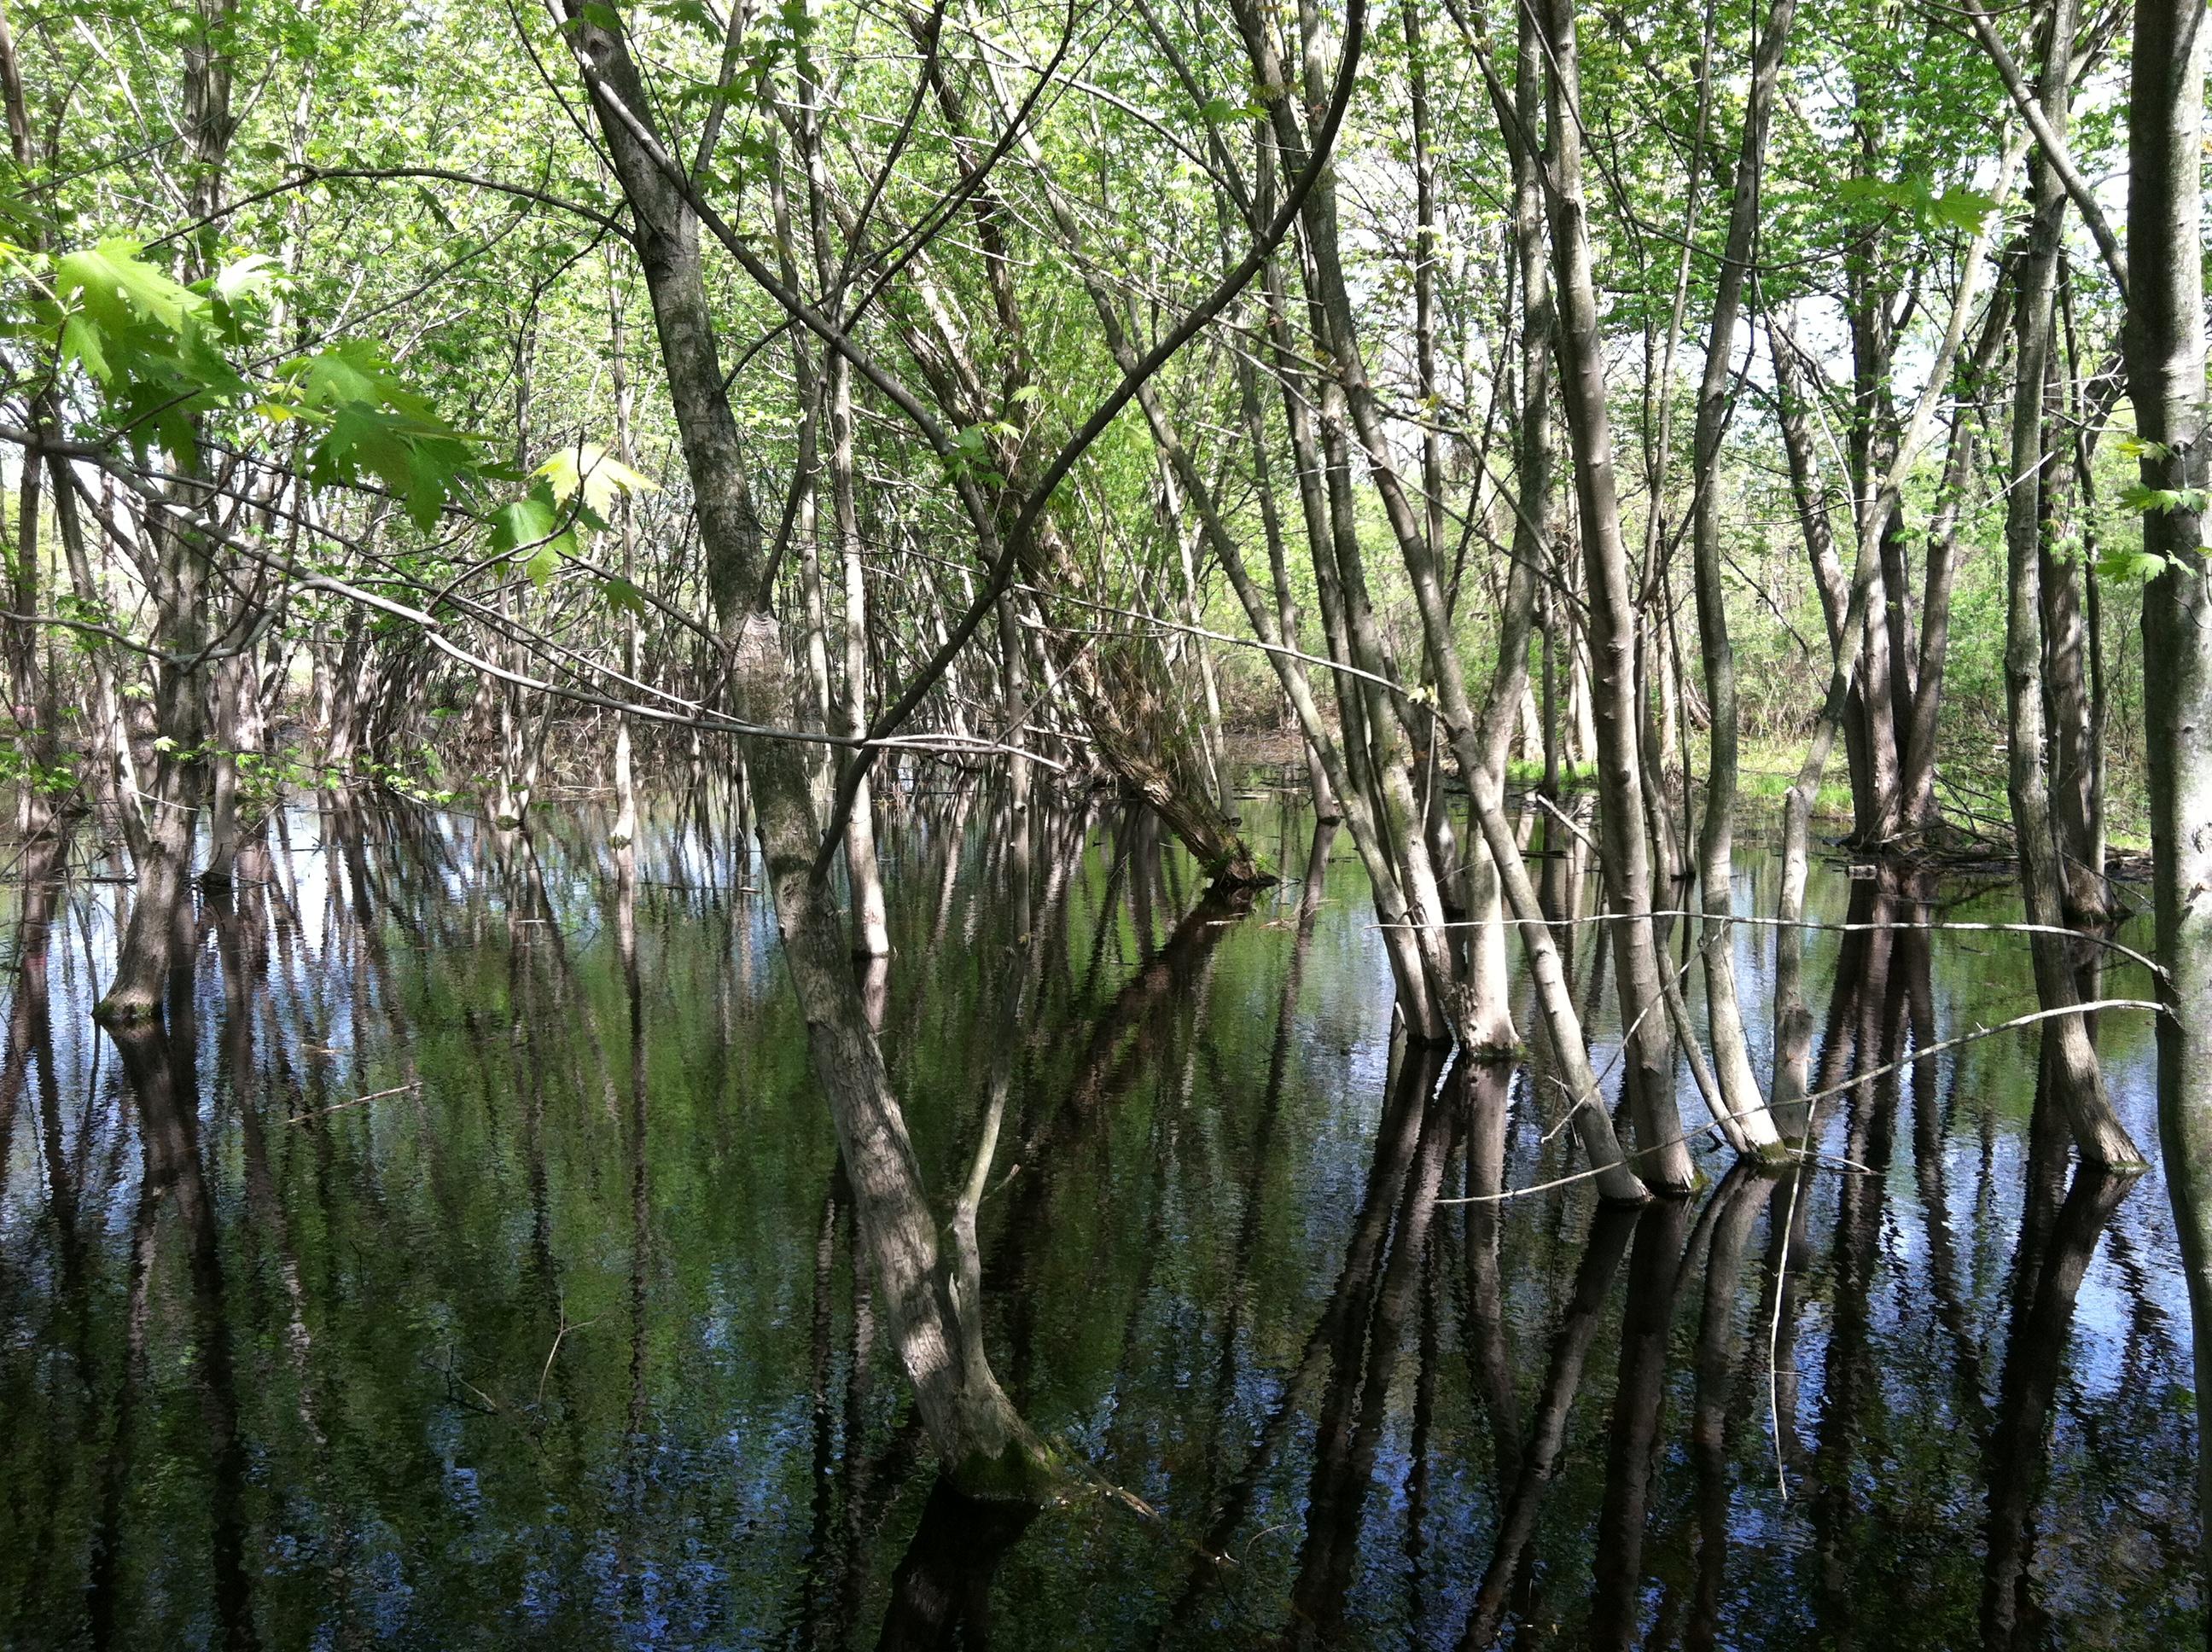 chicago wetland, floodplain, nature